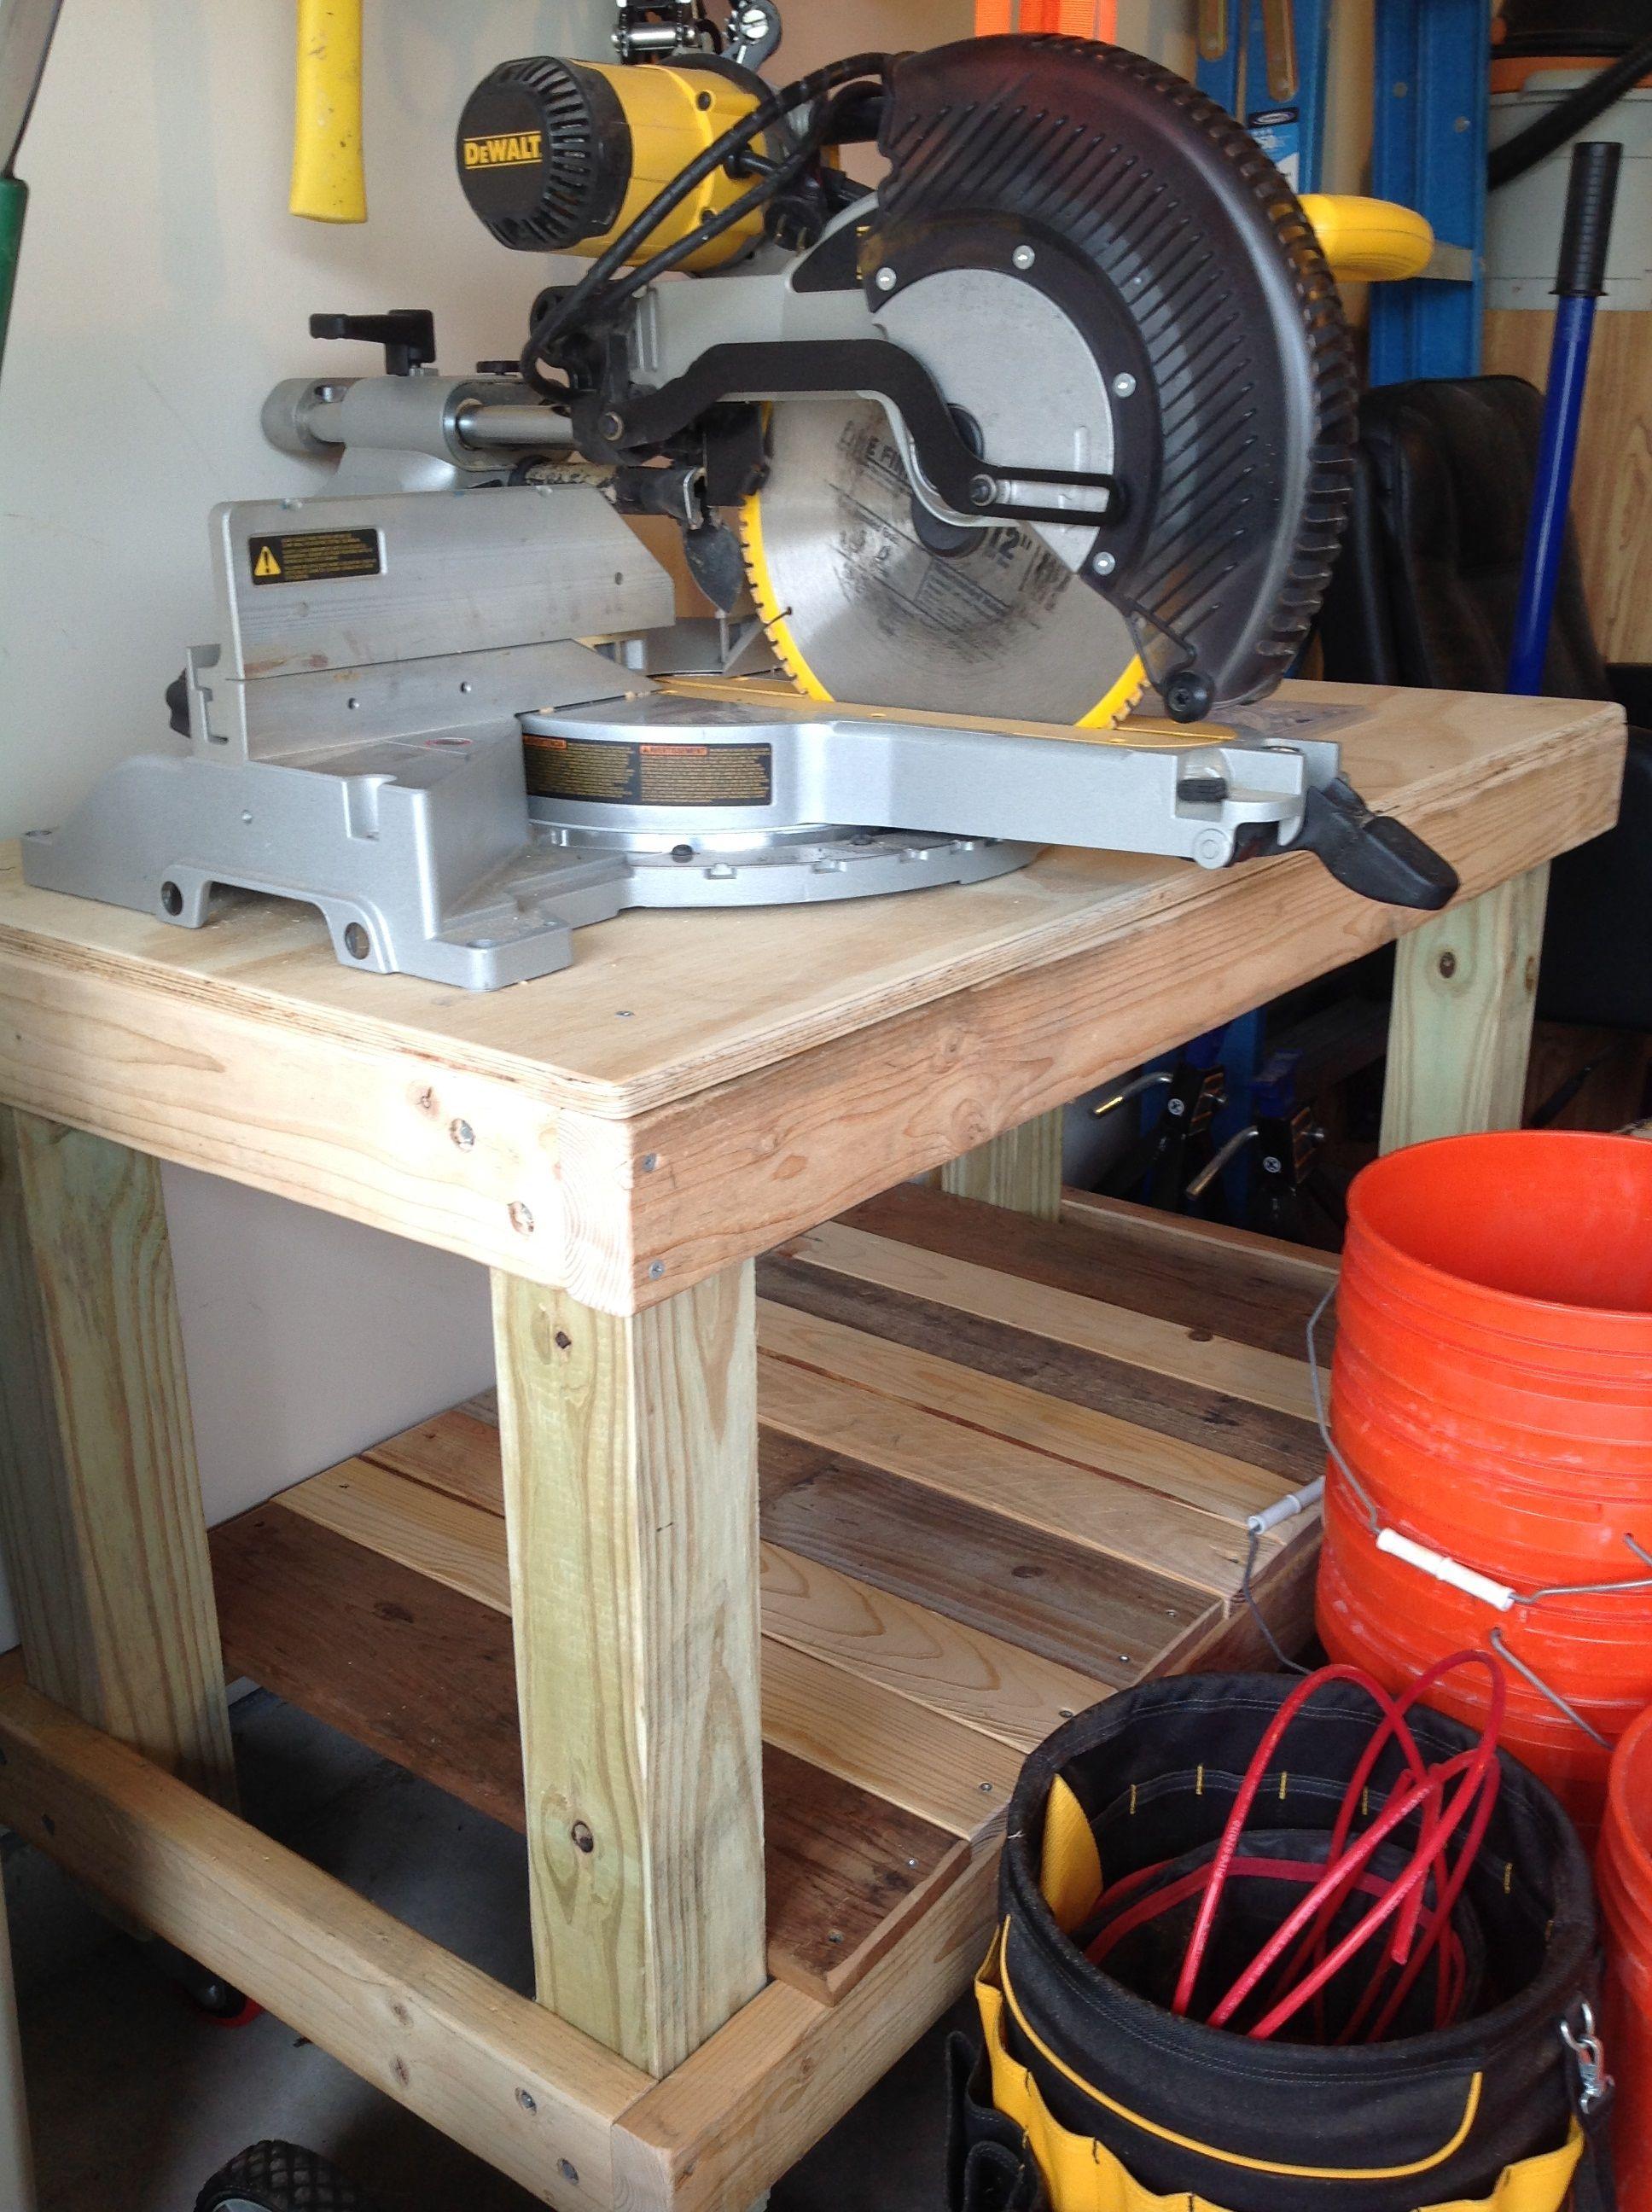 diy rolling workbench 4x4 post legs 2x4 frame pallet wood shelf locking - Rolling Workbench